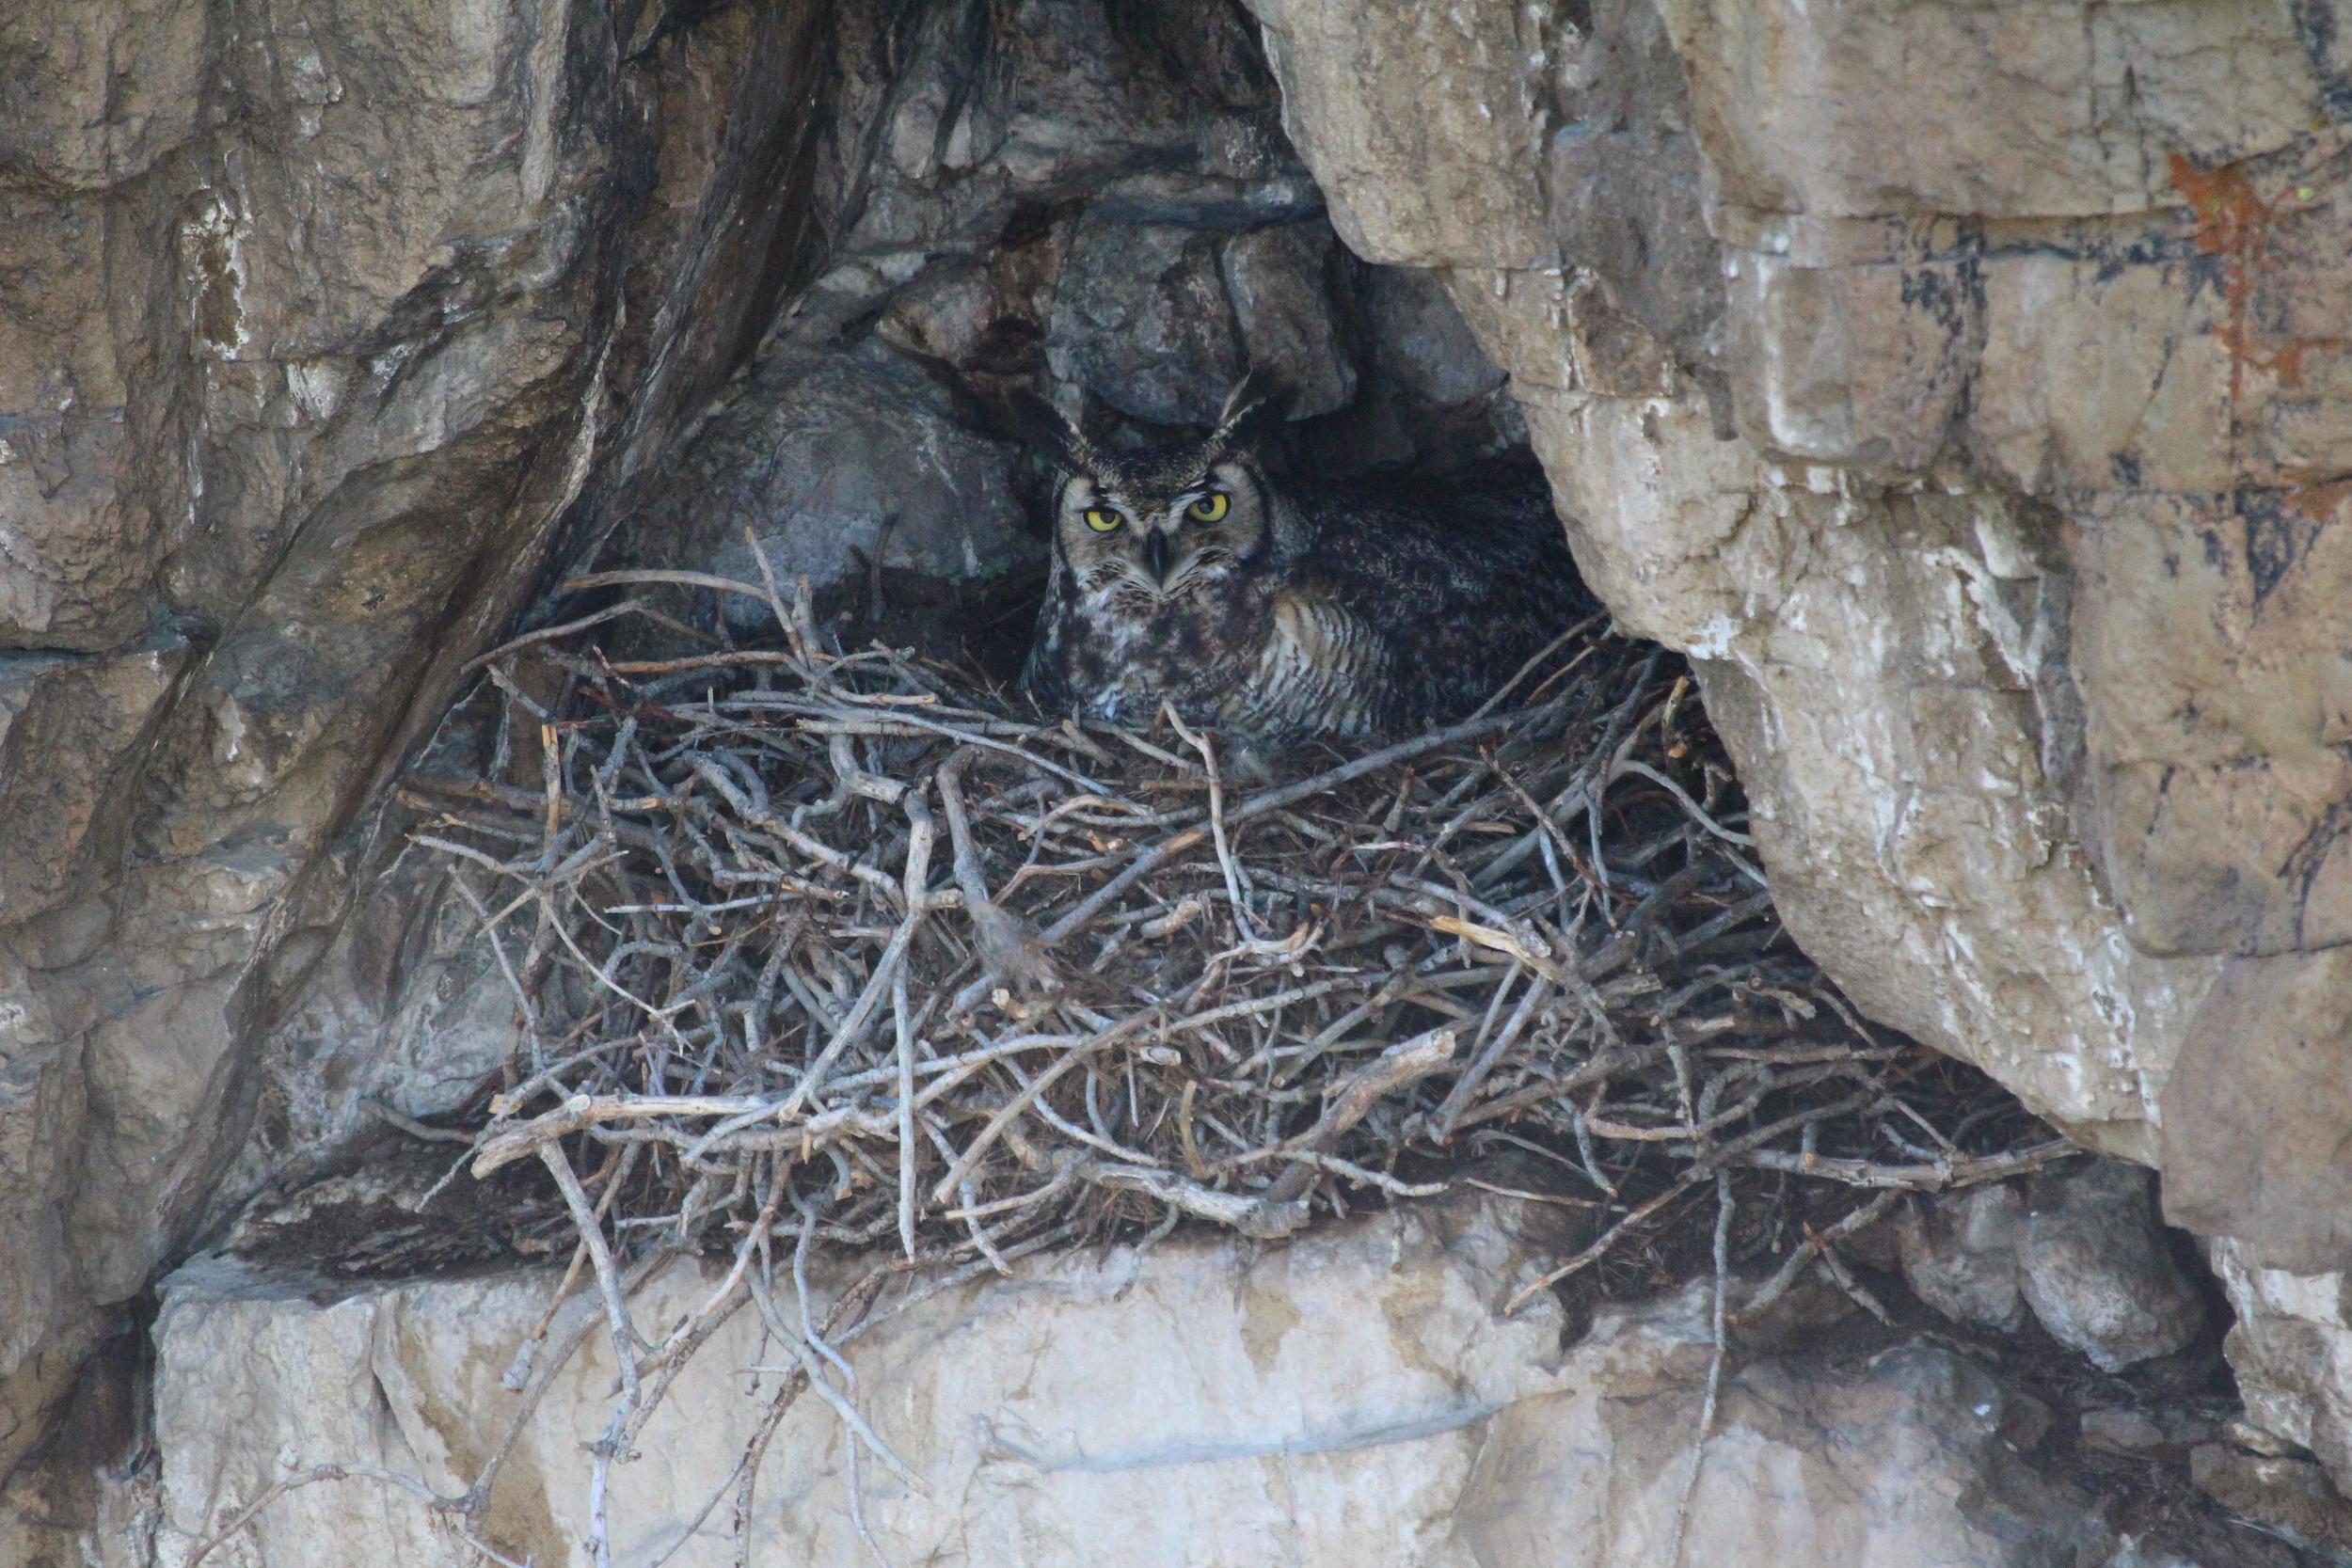 Great Horned Owl Photo courtesy of Michael Kuehn